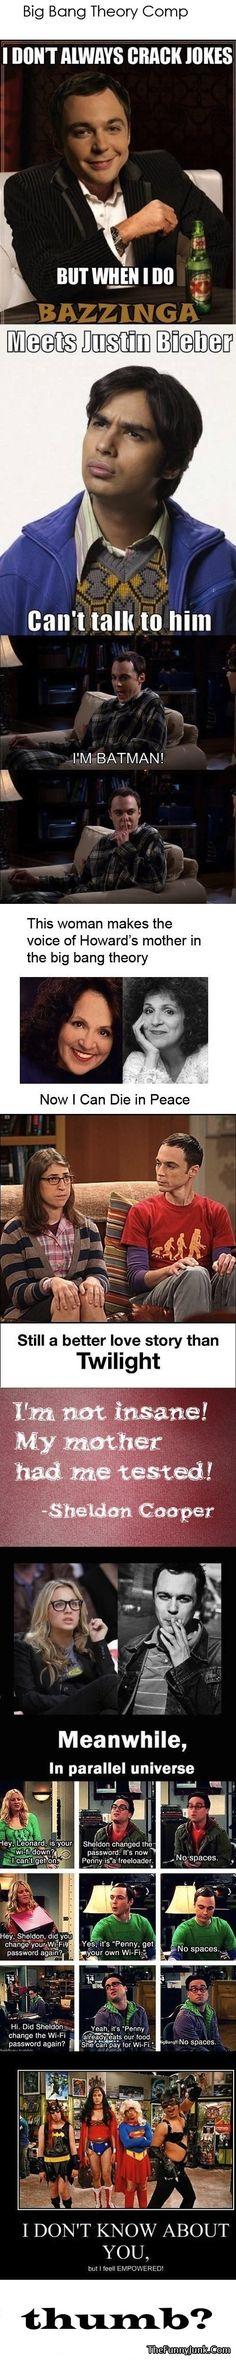 Gotta love Big Bang theory